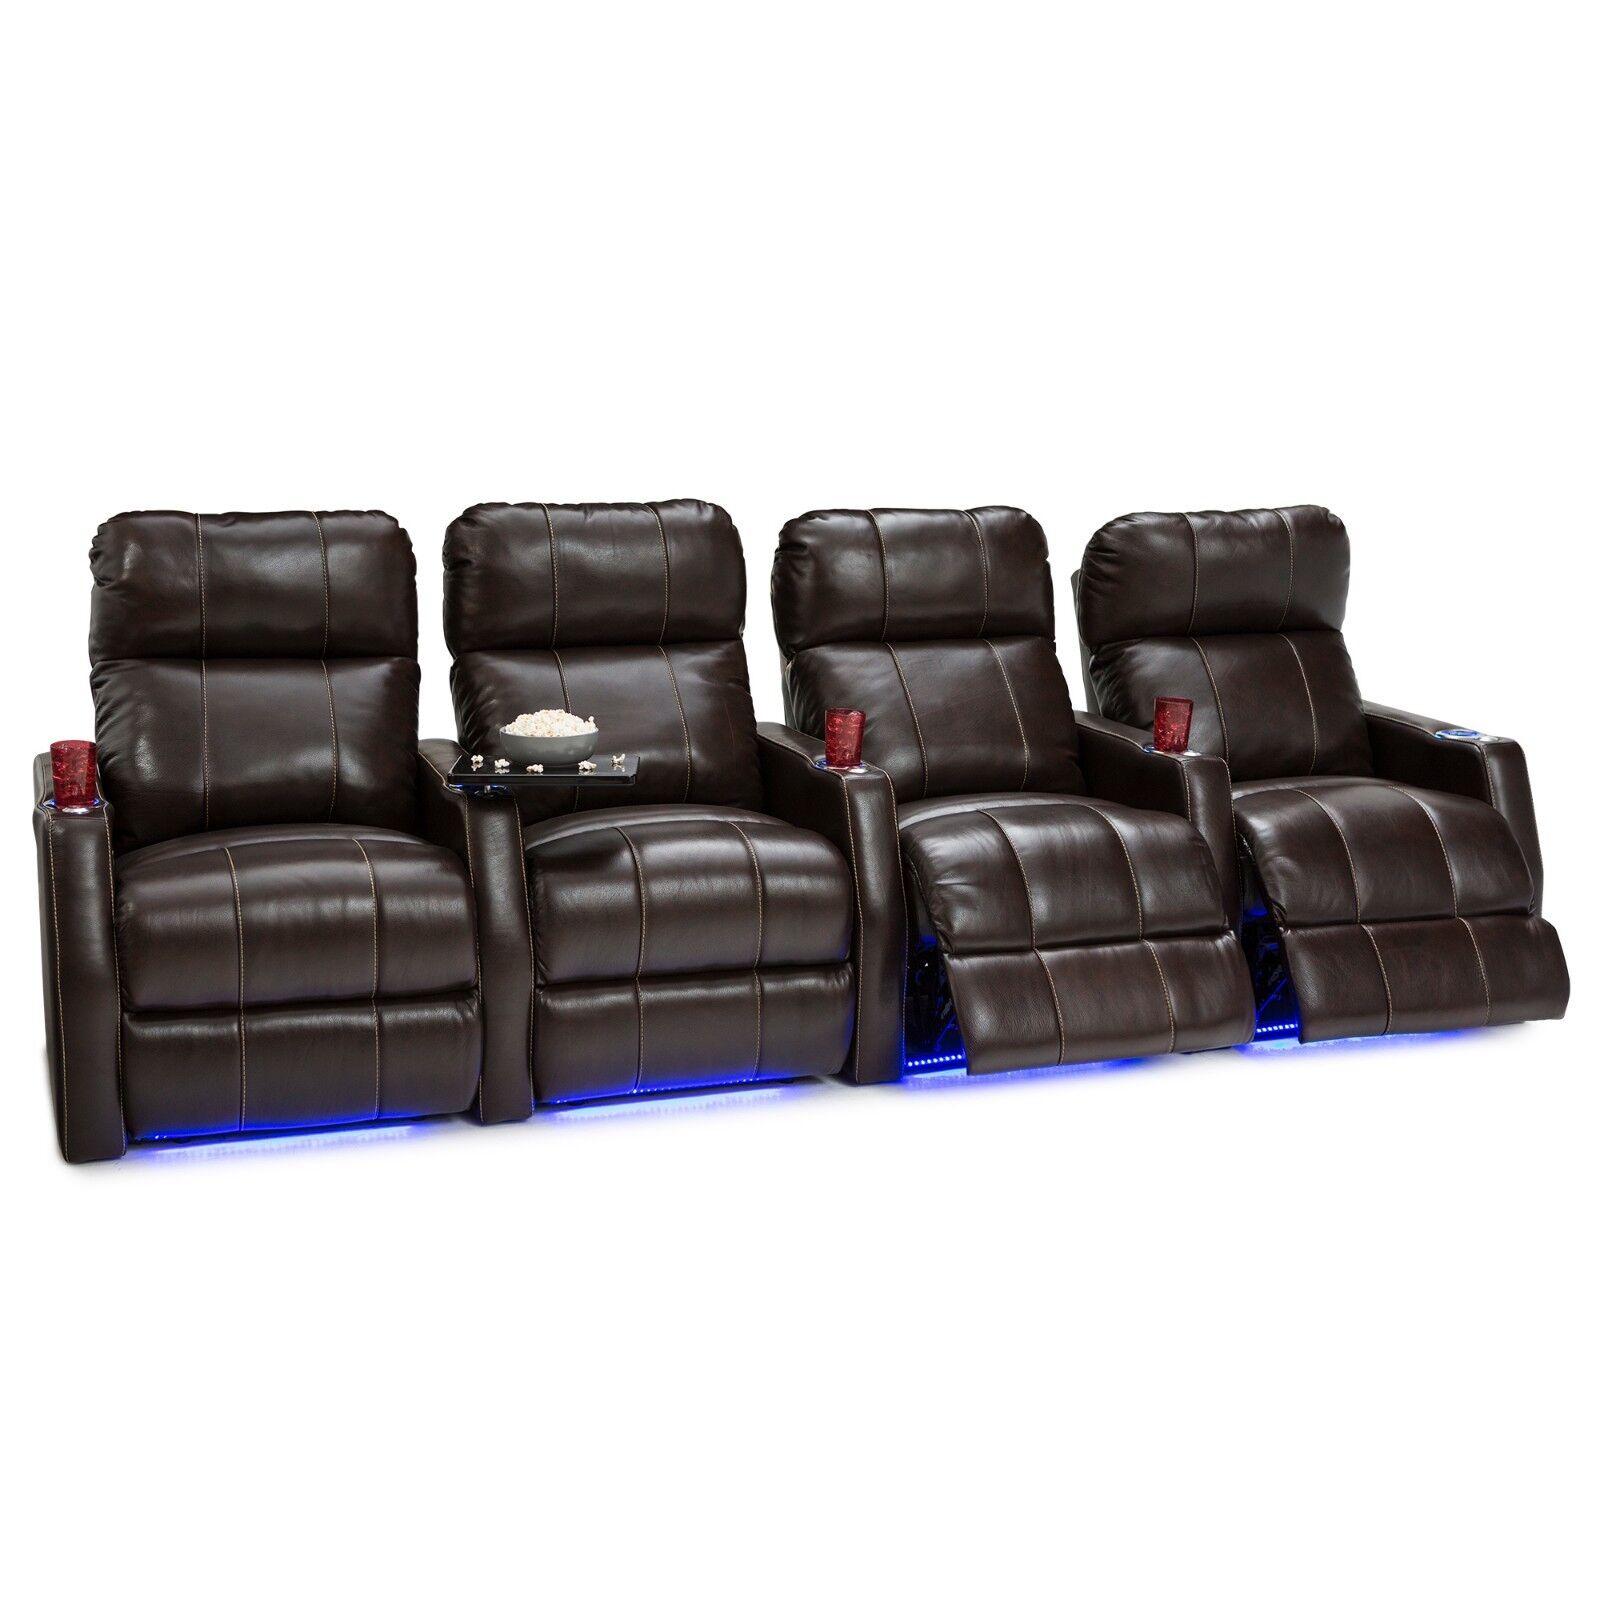 Seatcraft Brown Leather Power Recliner Adjustable Headrest H